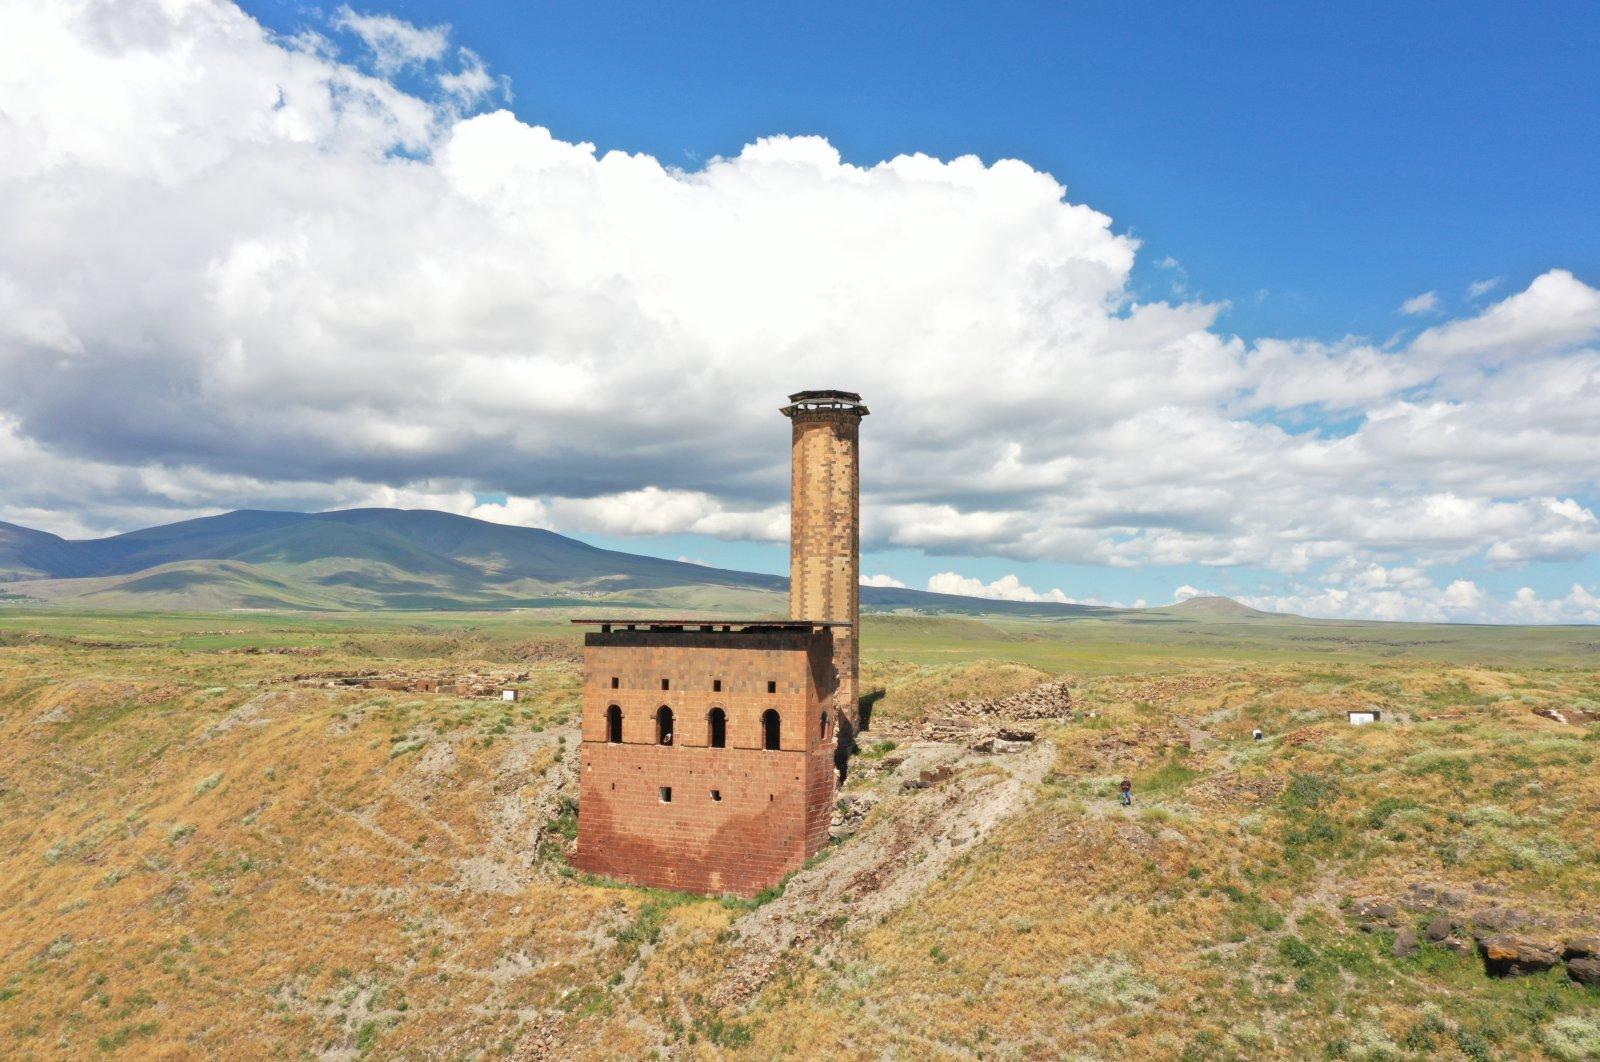 The Ebu'l Manuçehr Mosque was built after Seljuks won the Battle of Manzikert in 1071. (AA Photo)